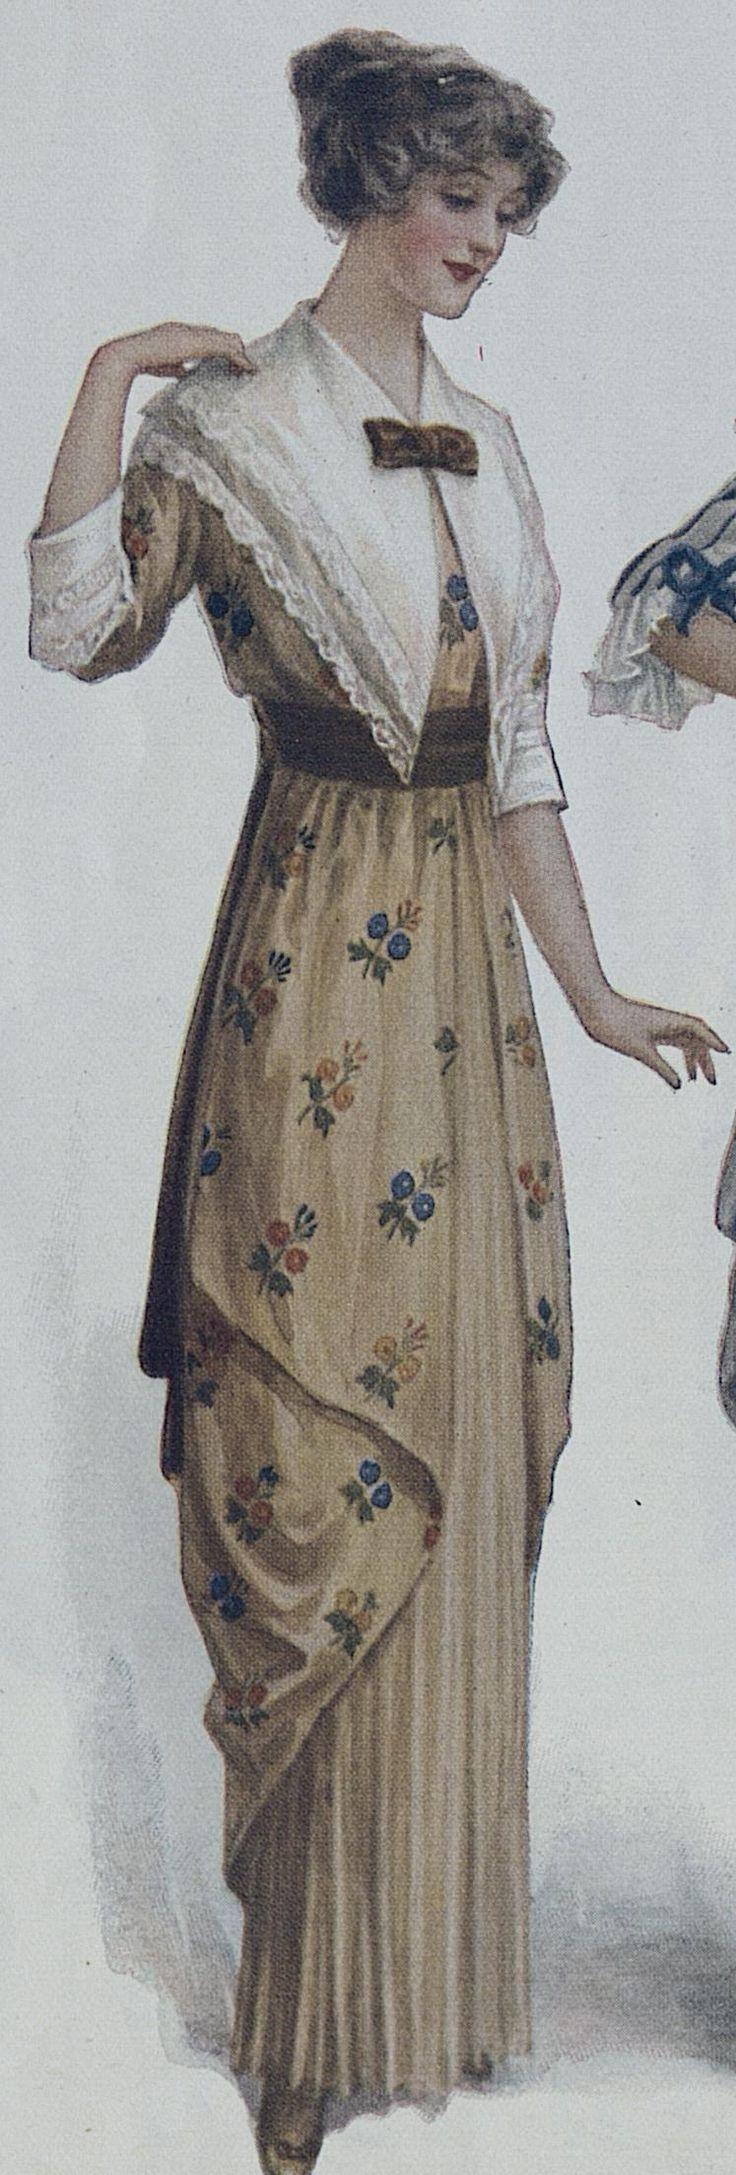 Ladies Home Journal. February, 1914 brown dress